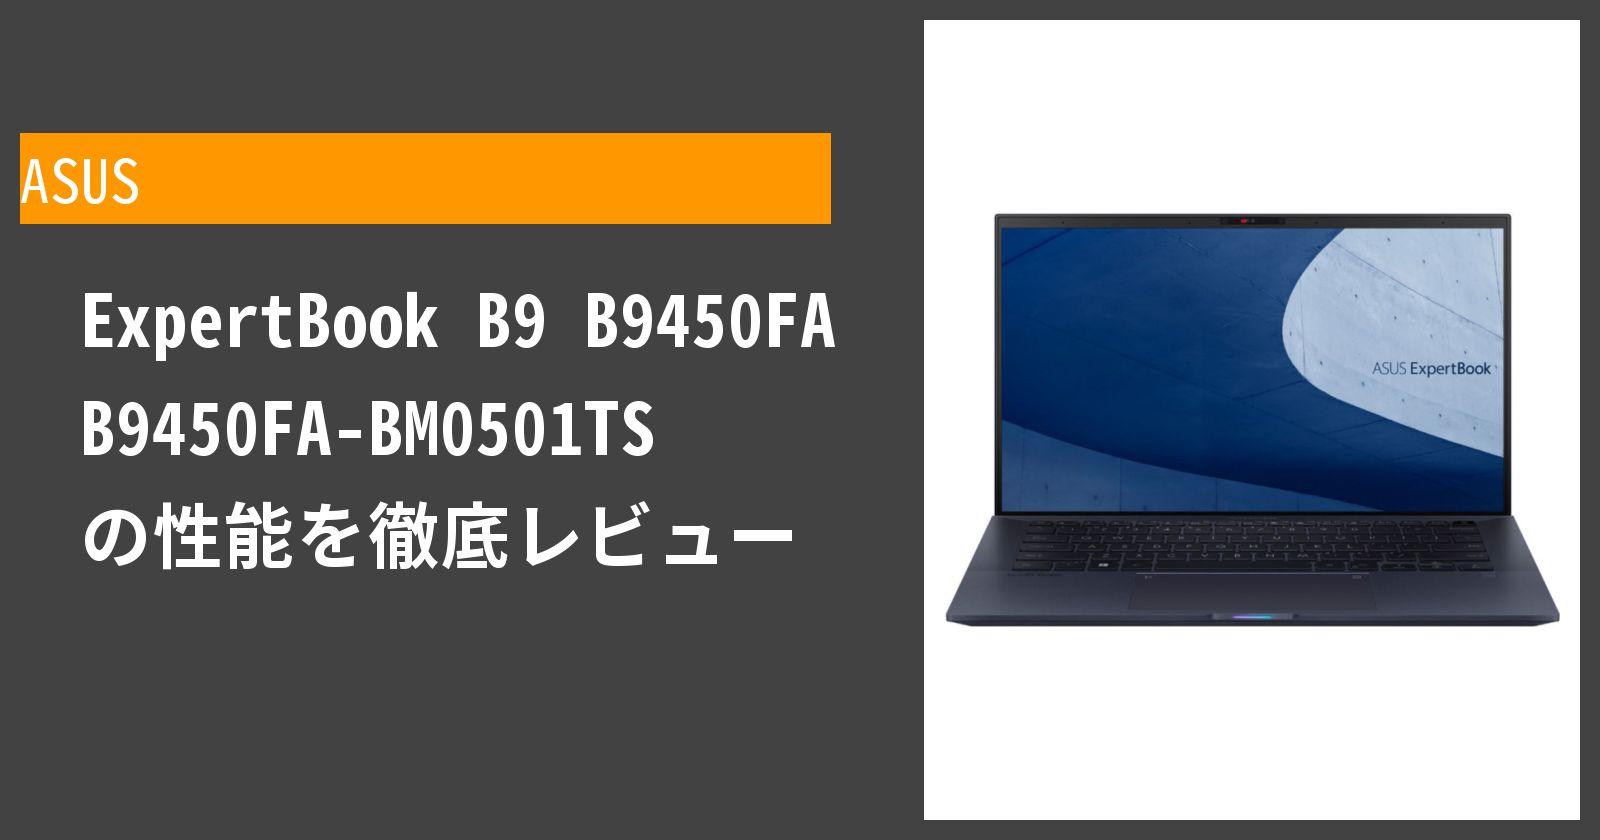 ExpertBook B9 B9450FA B9450FA-BM0501TS の性能を徹底レビュー